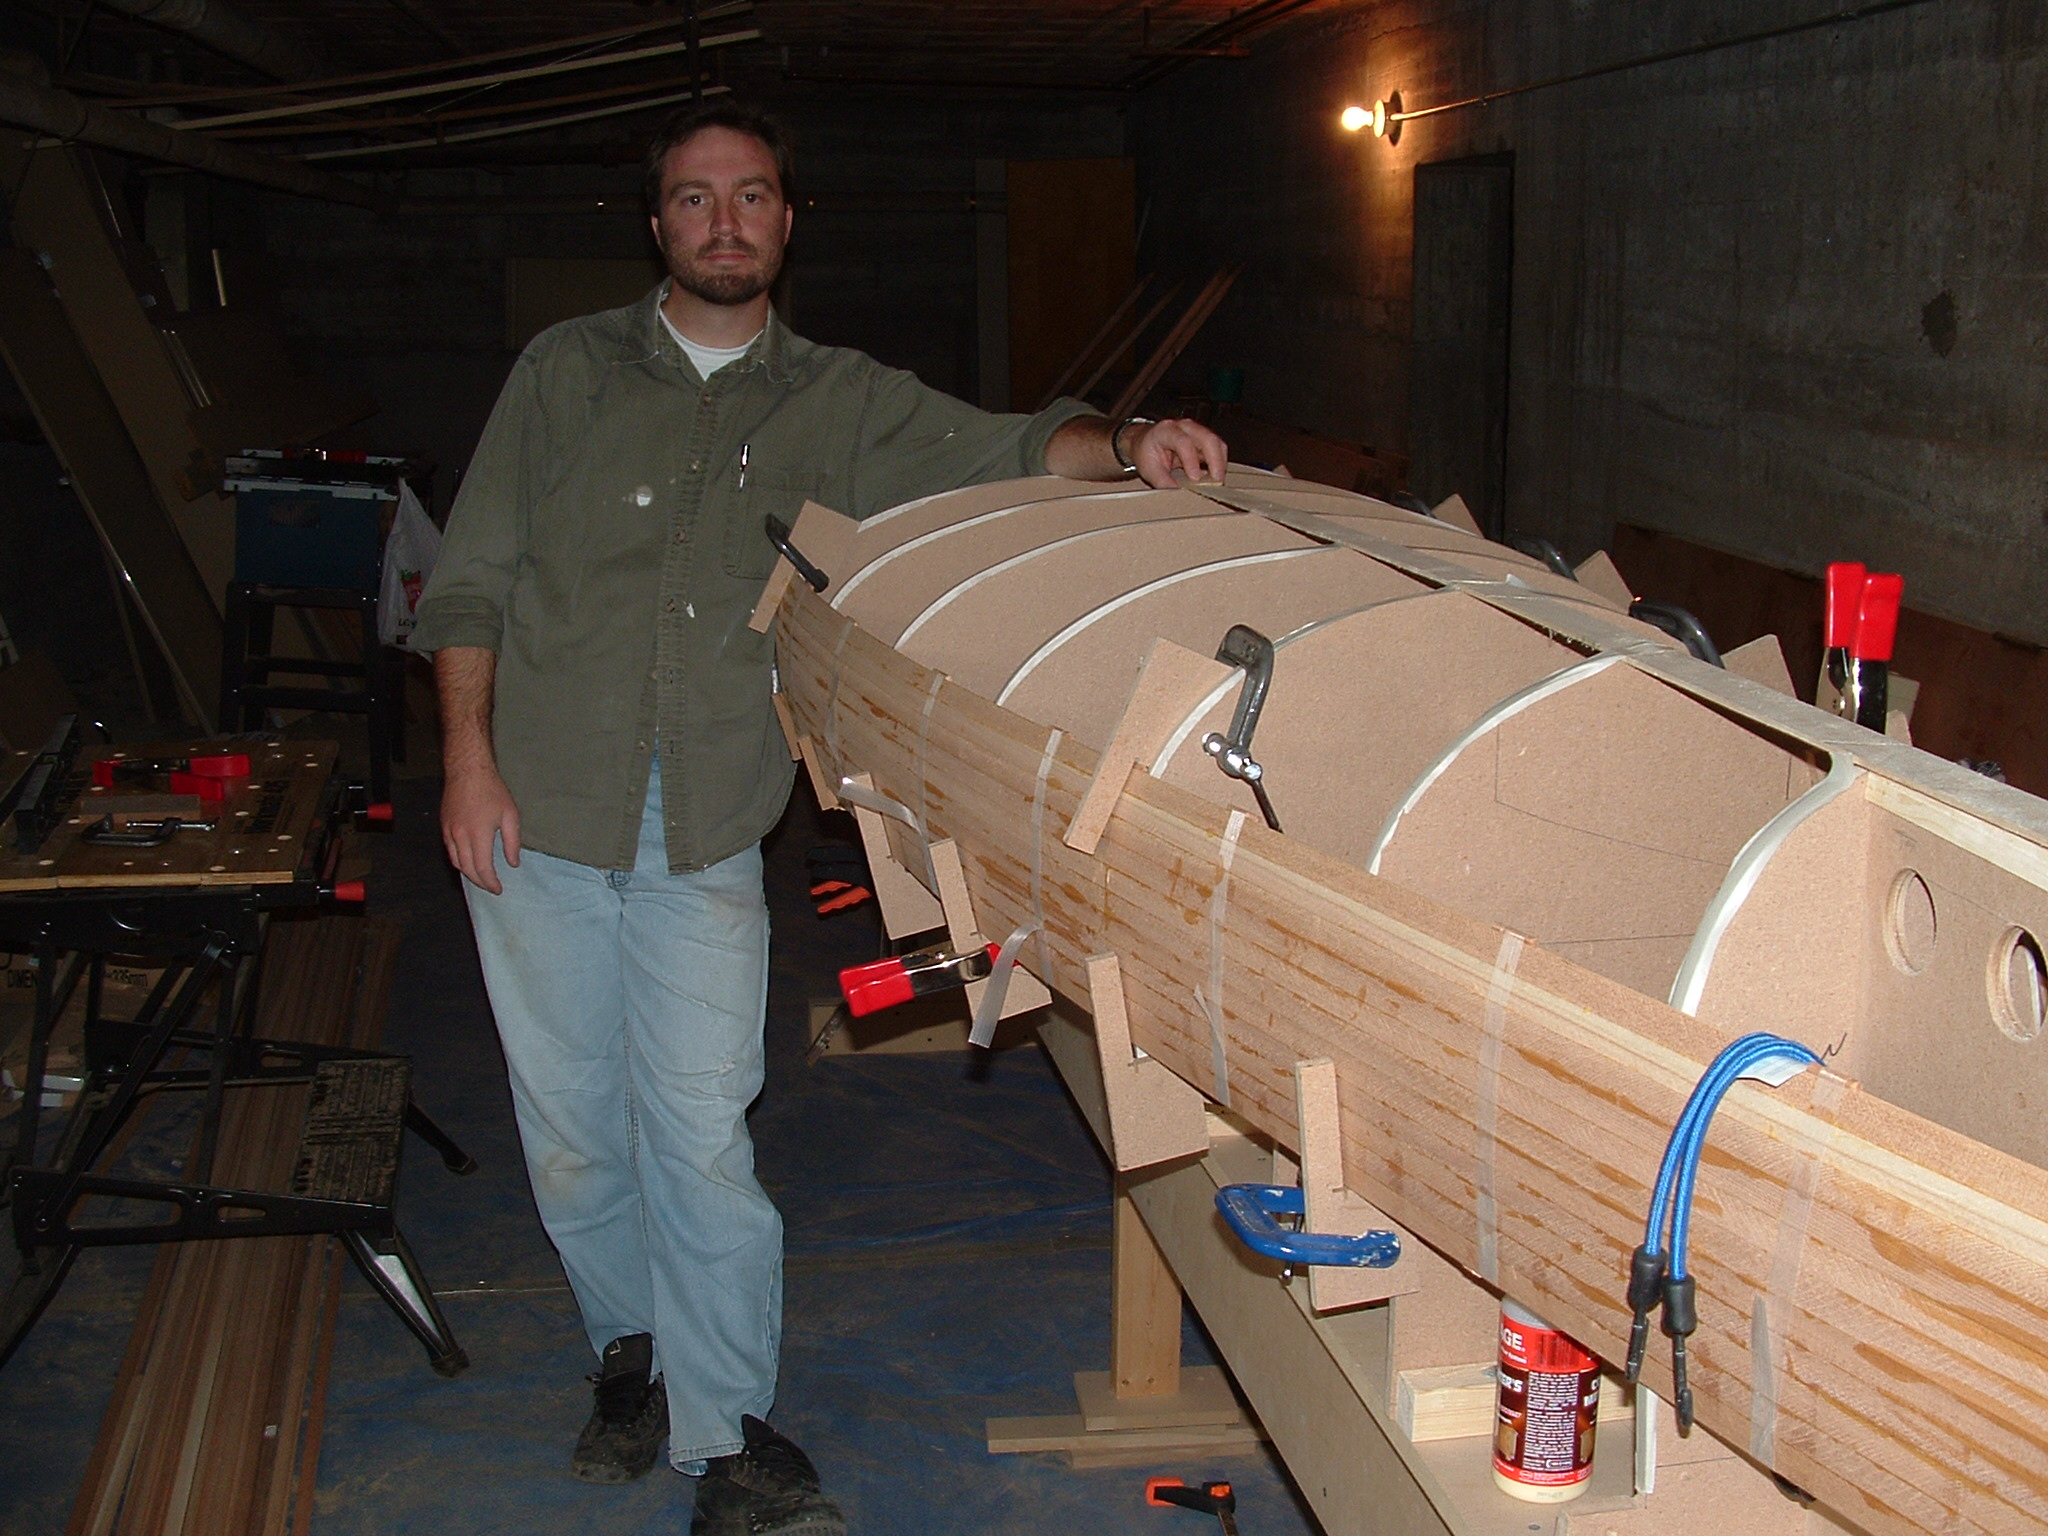 Canoe building selfie